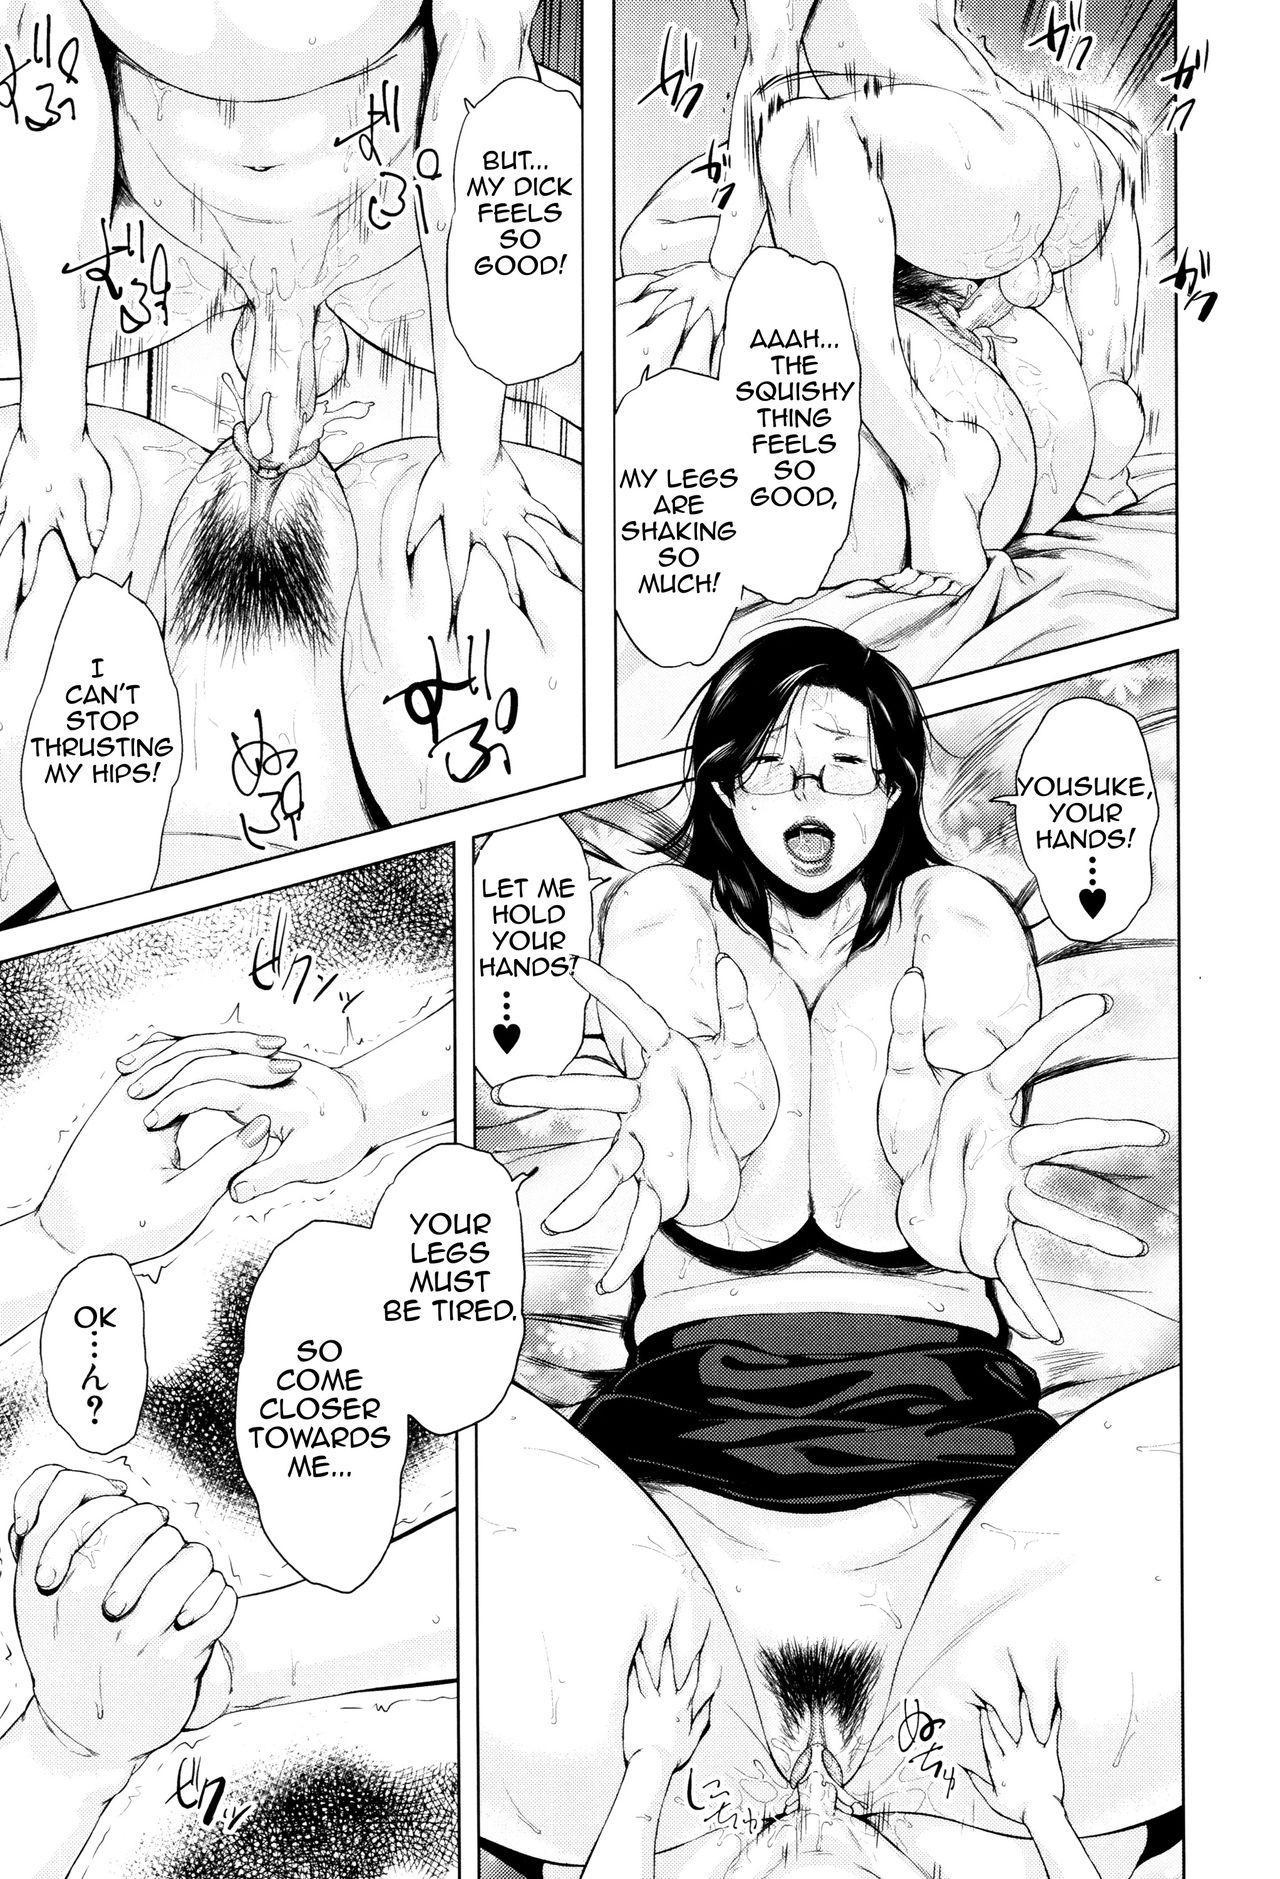 [Jitsuma] Kinyoubi no Haha-tachi e - To Friday's mothers [English] [Amoskandy, desudesu, Kusanyagi] 131